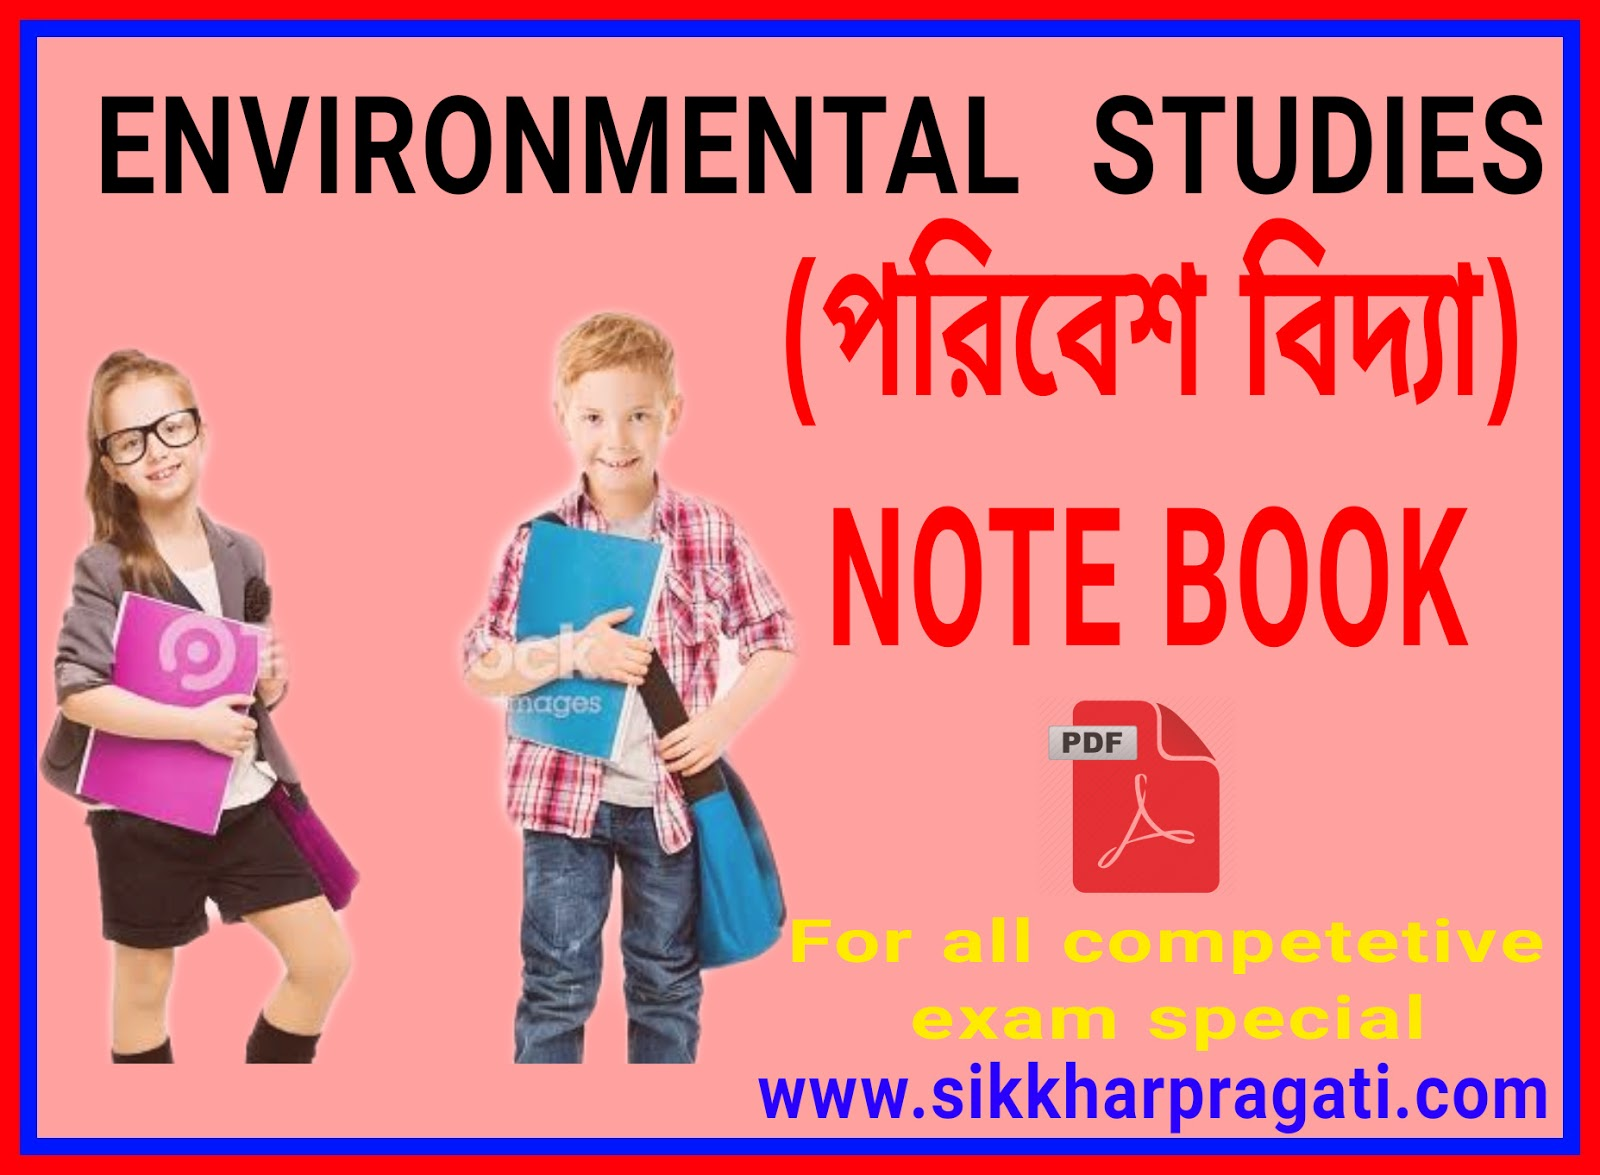 Environmental Studies Note Book Pdf in Bengali (পরিবেশ বিদ্যা নোটবুক)